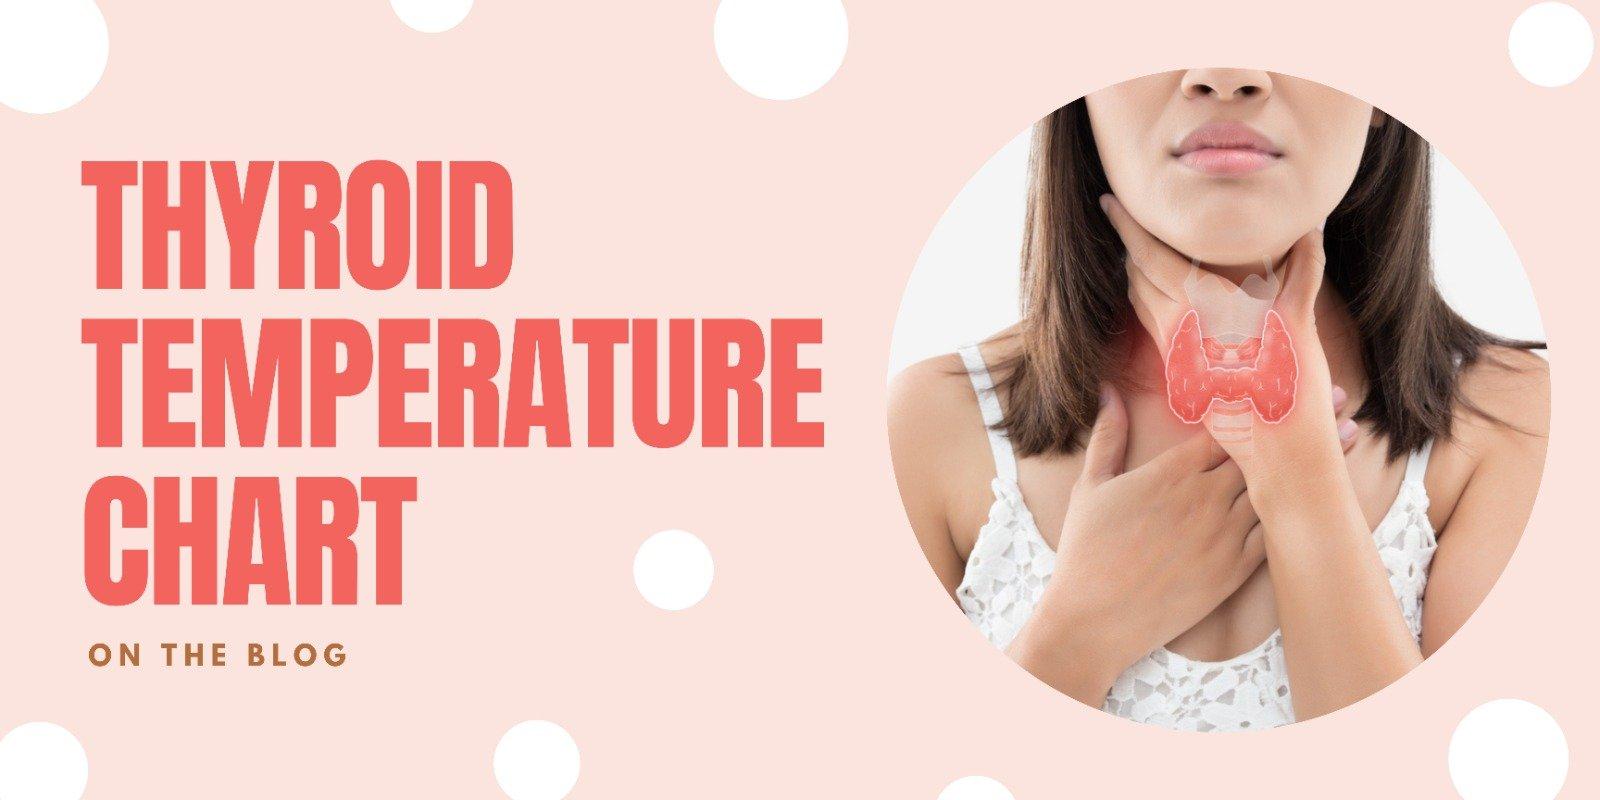 Thyroid Temperature Chart